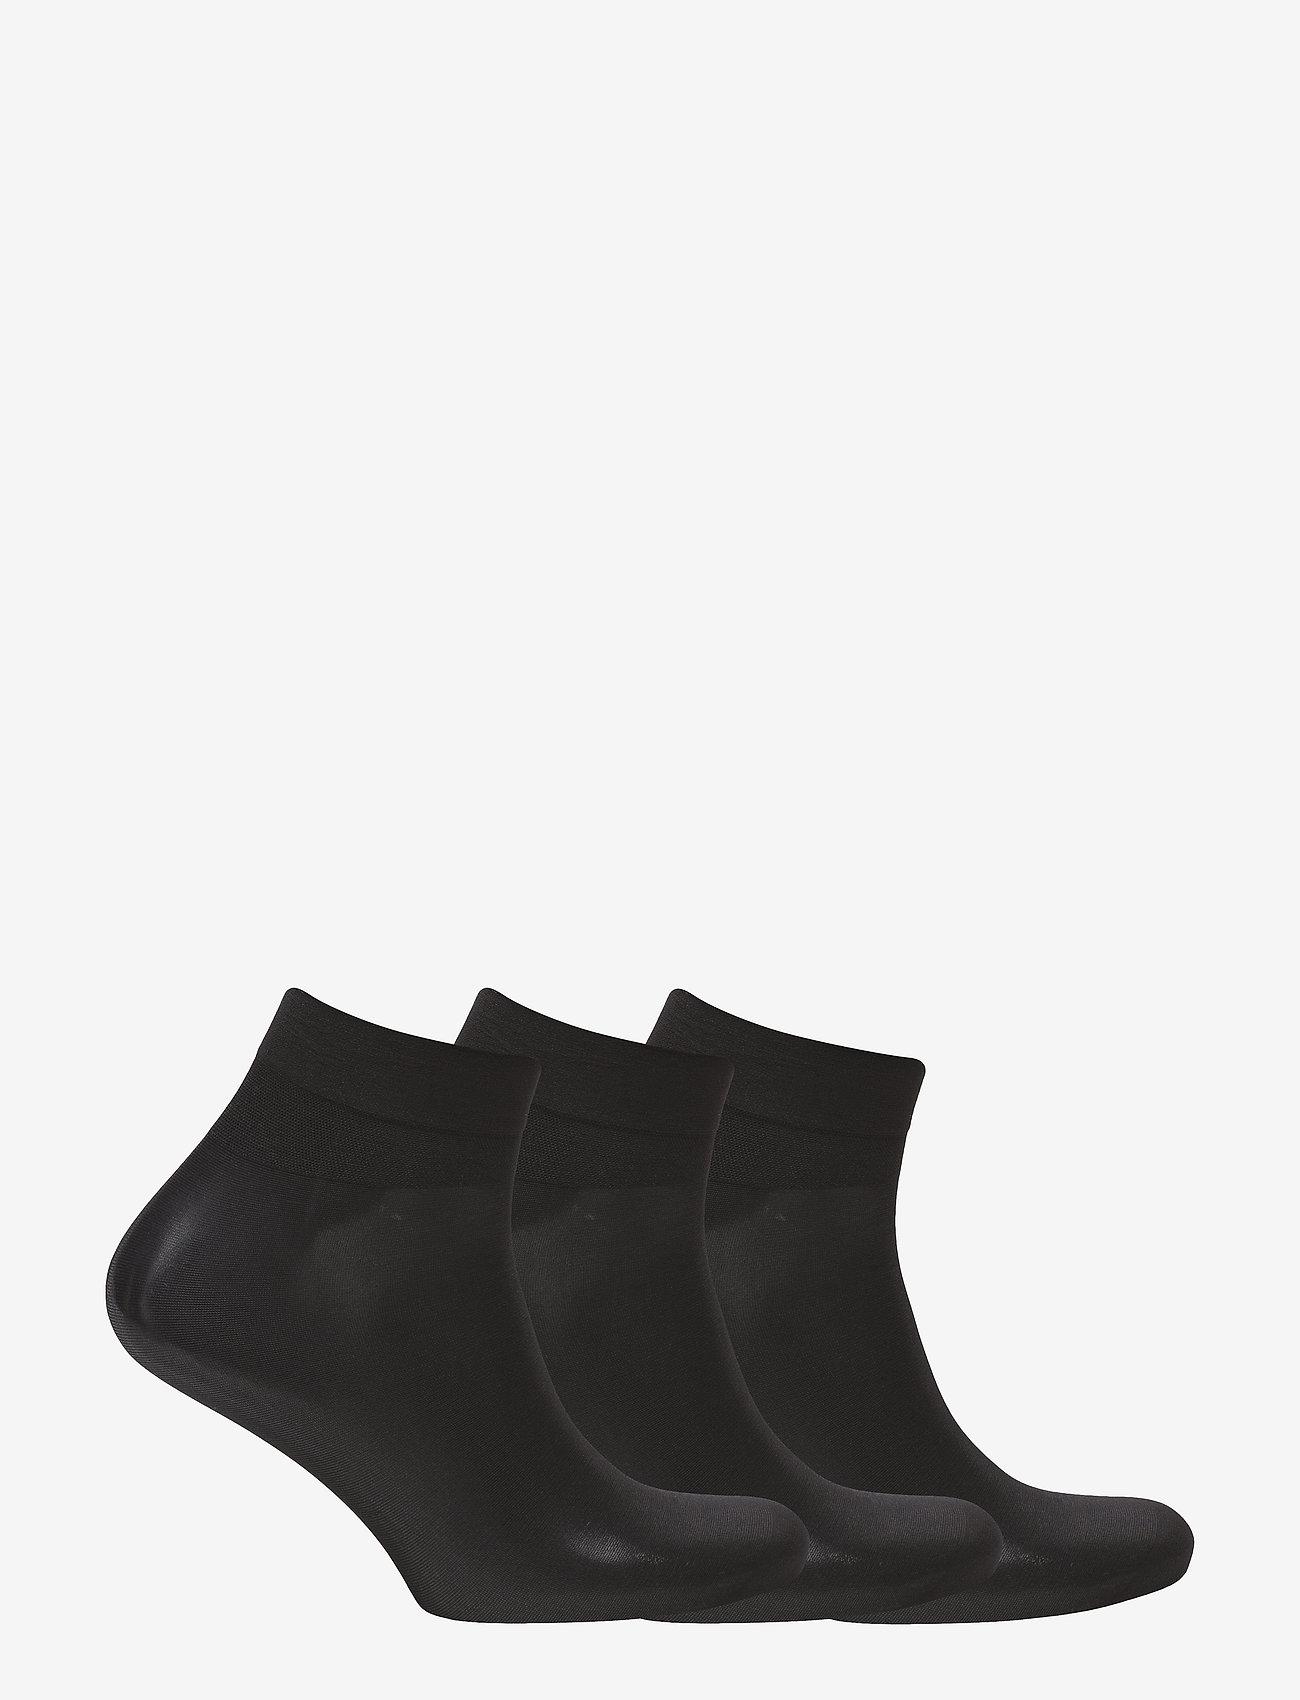 Hudson - SIMPLY 20 3-PACK - tavalliset sukat - black - 1